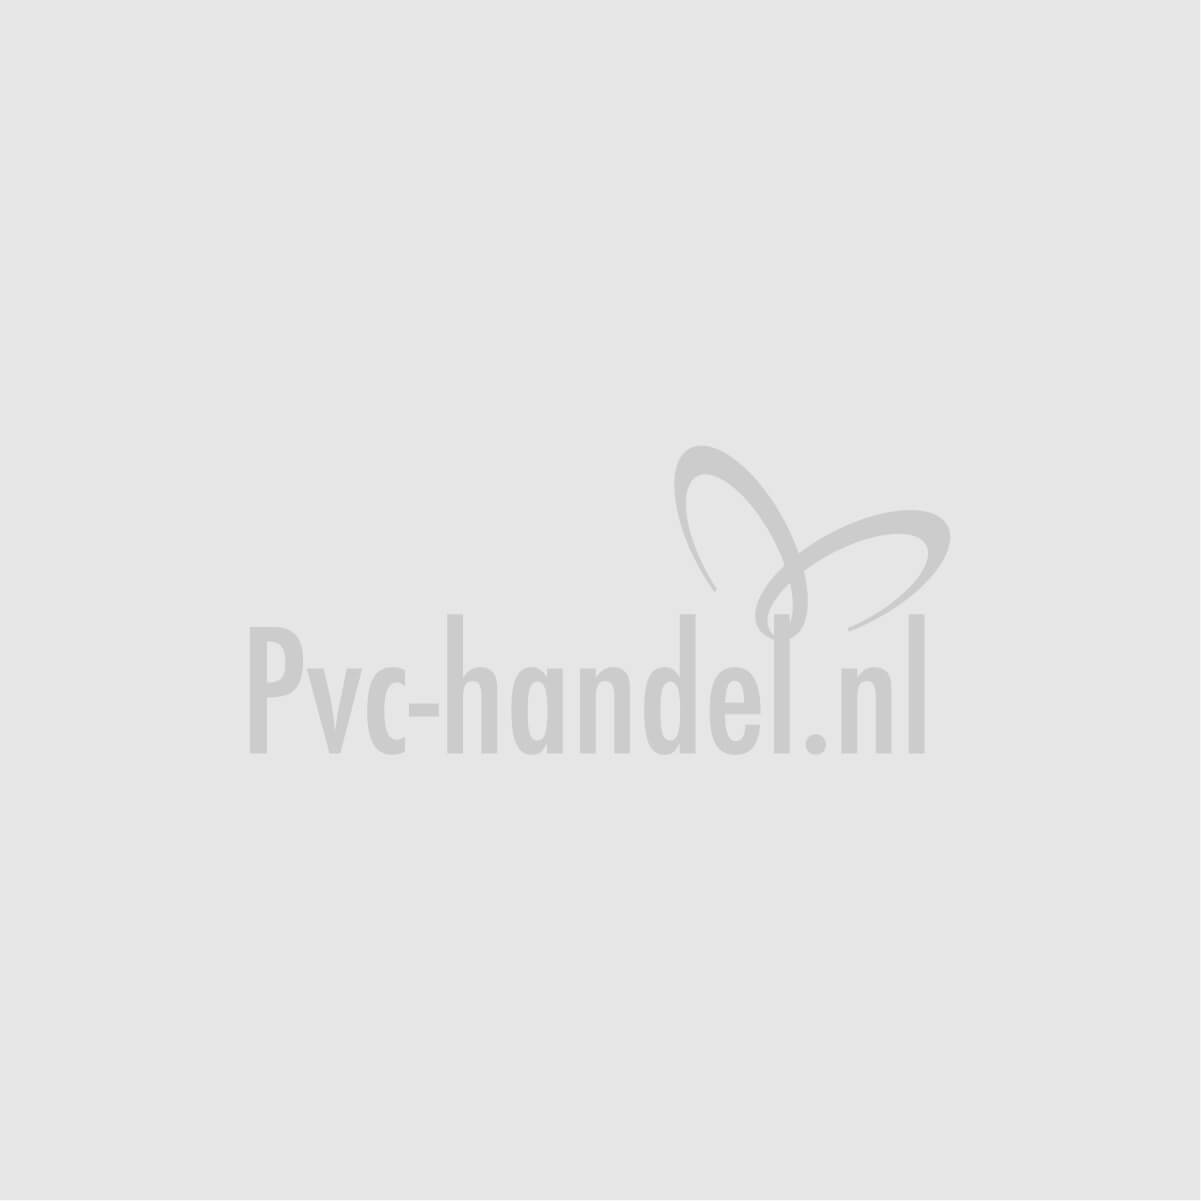 PVC verlijmbare slang grijs